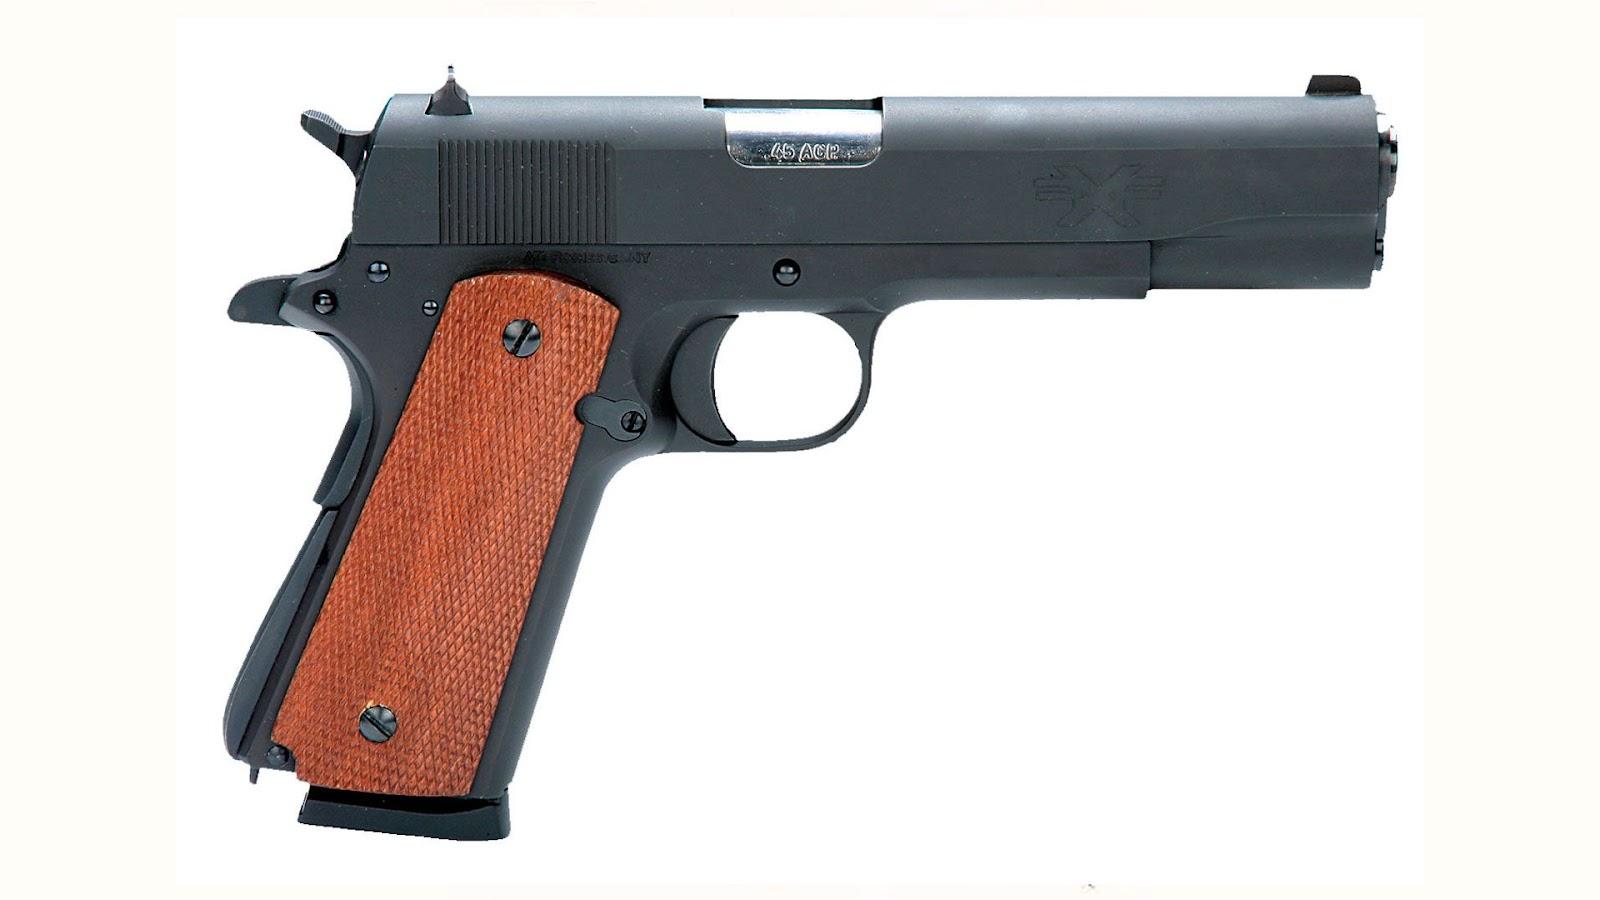 ATI Firepower Xtreme 45ACP 1911 pistol